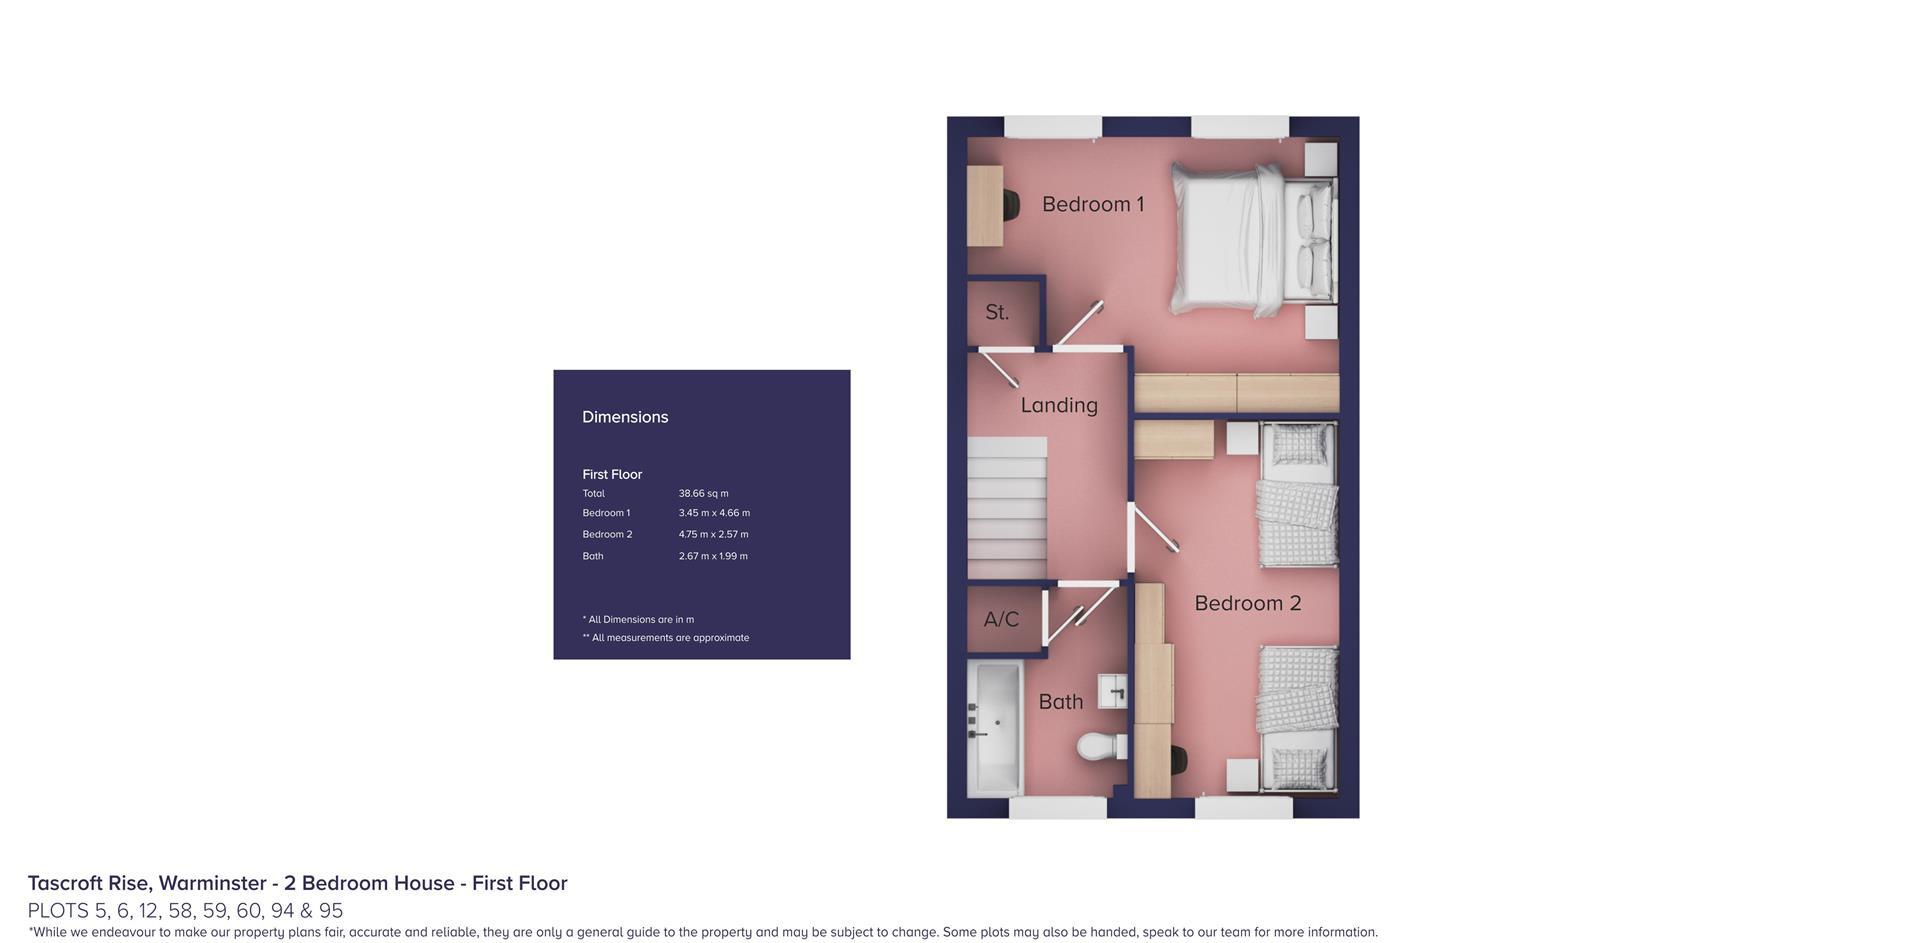 Tascroft Rise, Warminster_Plots 5, 6, 12, 58, 59,